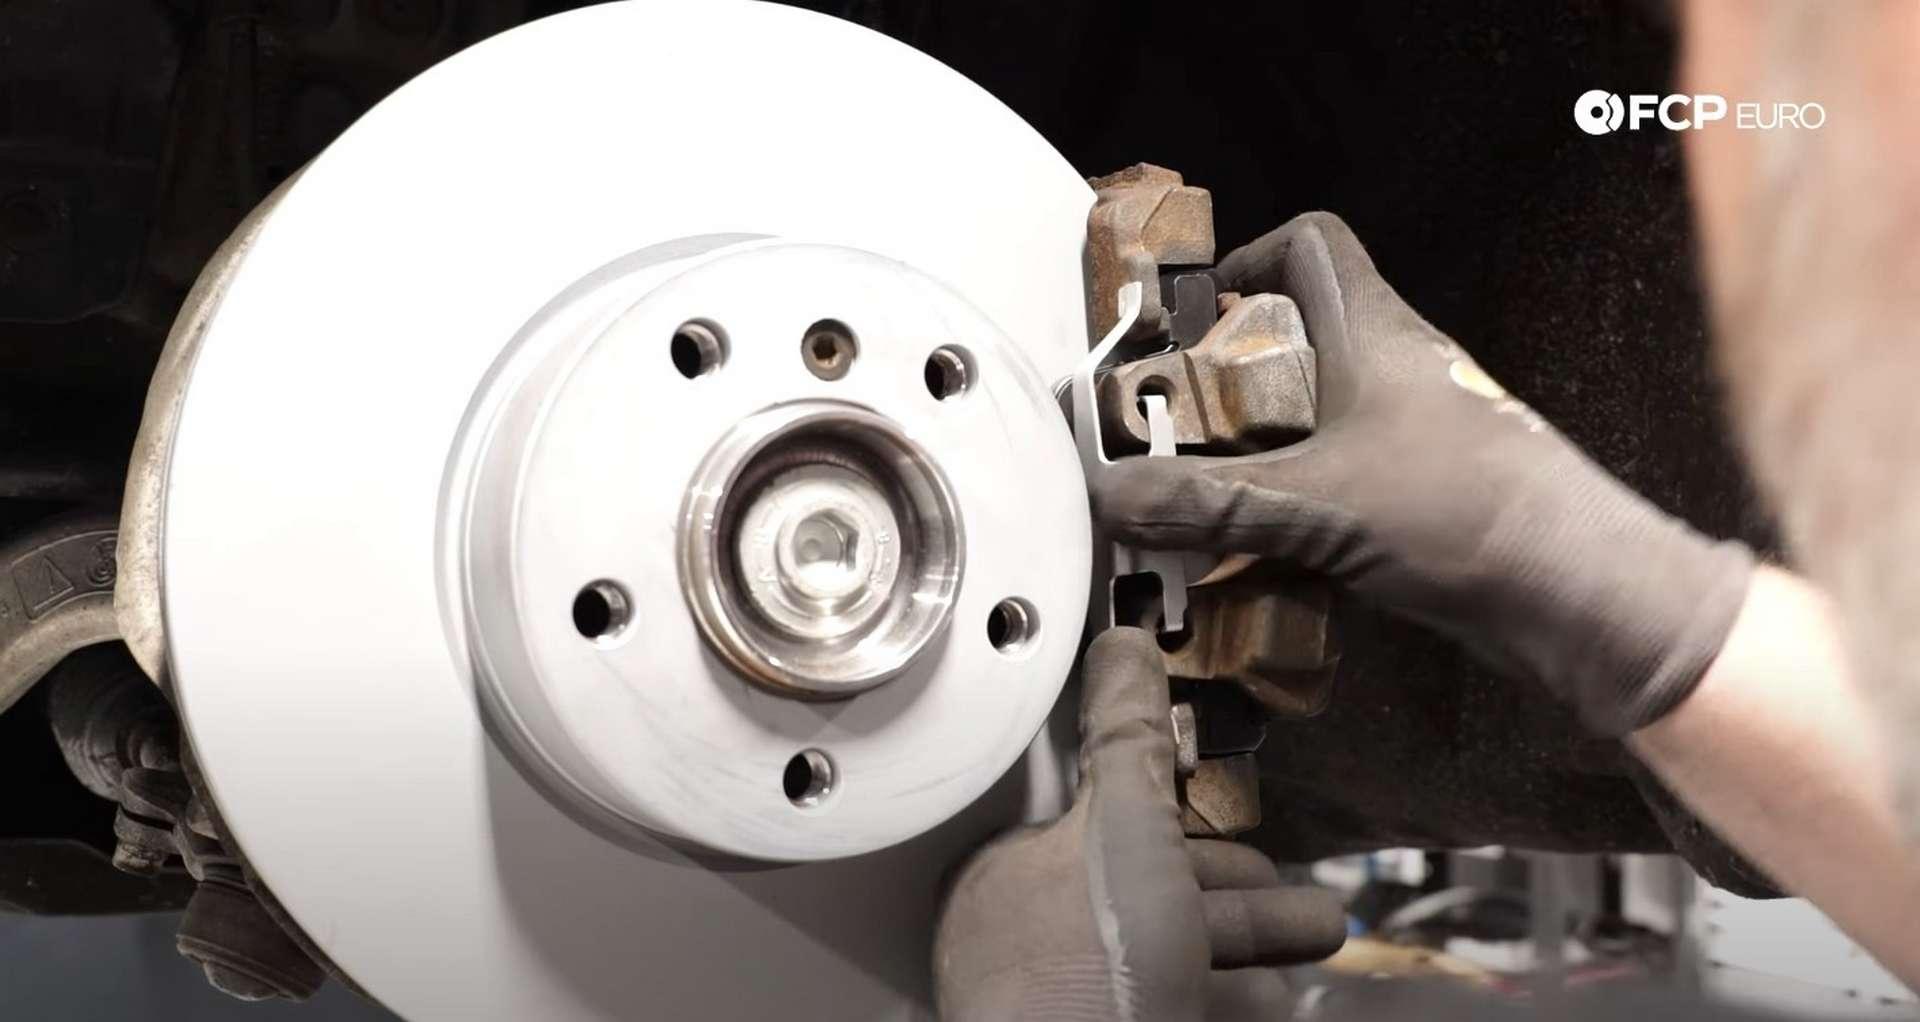 09-DIY-BMW-F30-Front-Brake-Service_Refitting-The-Caliper